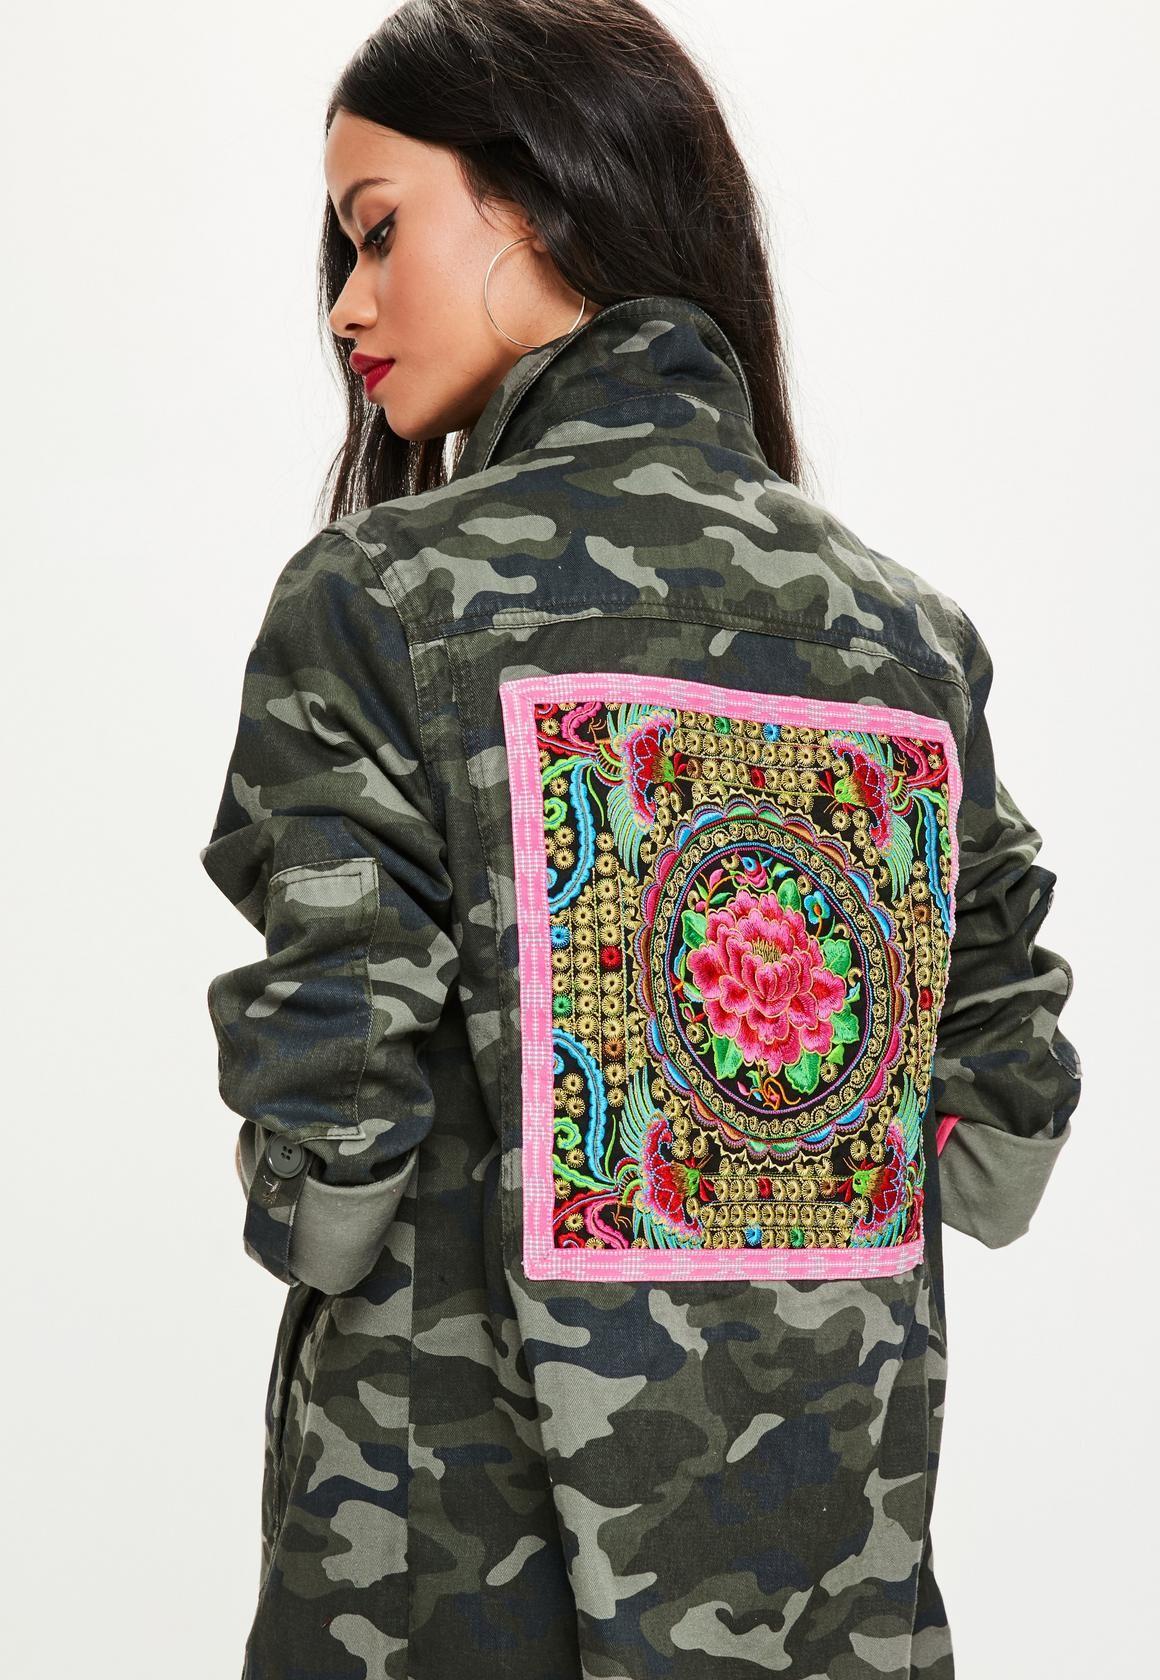 Khaki Camo Embroidered Jacket - Missguided